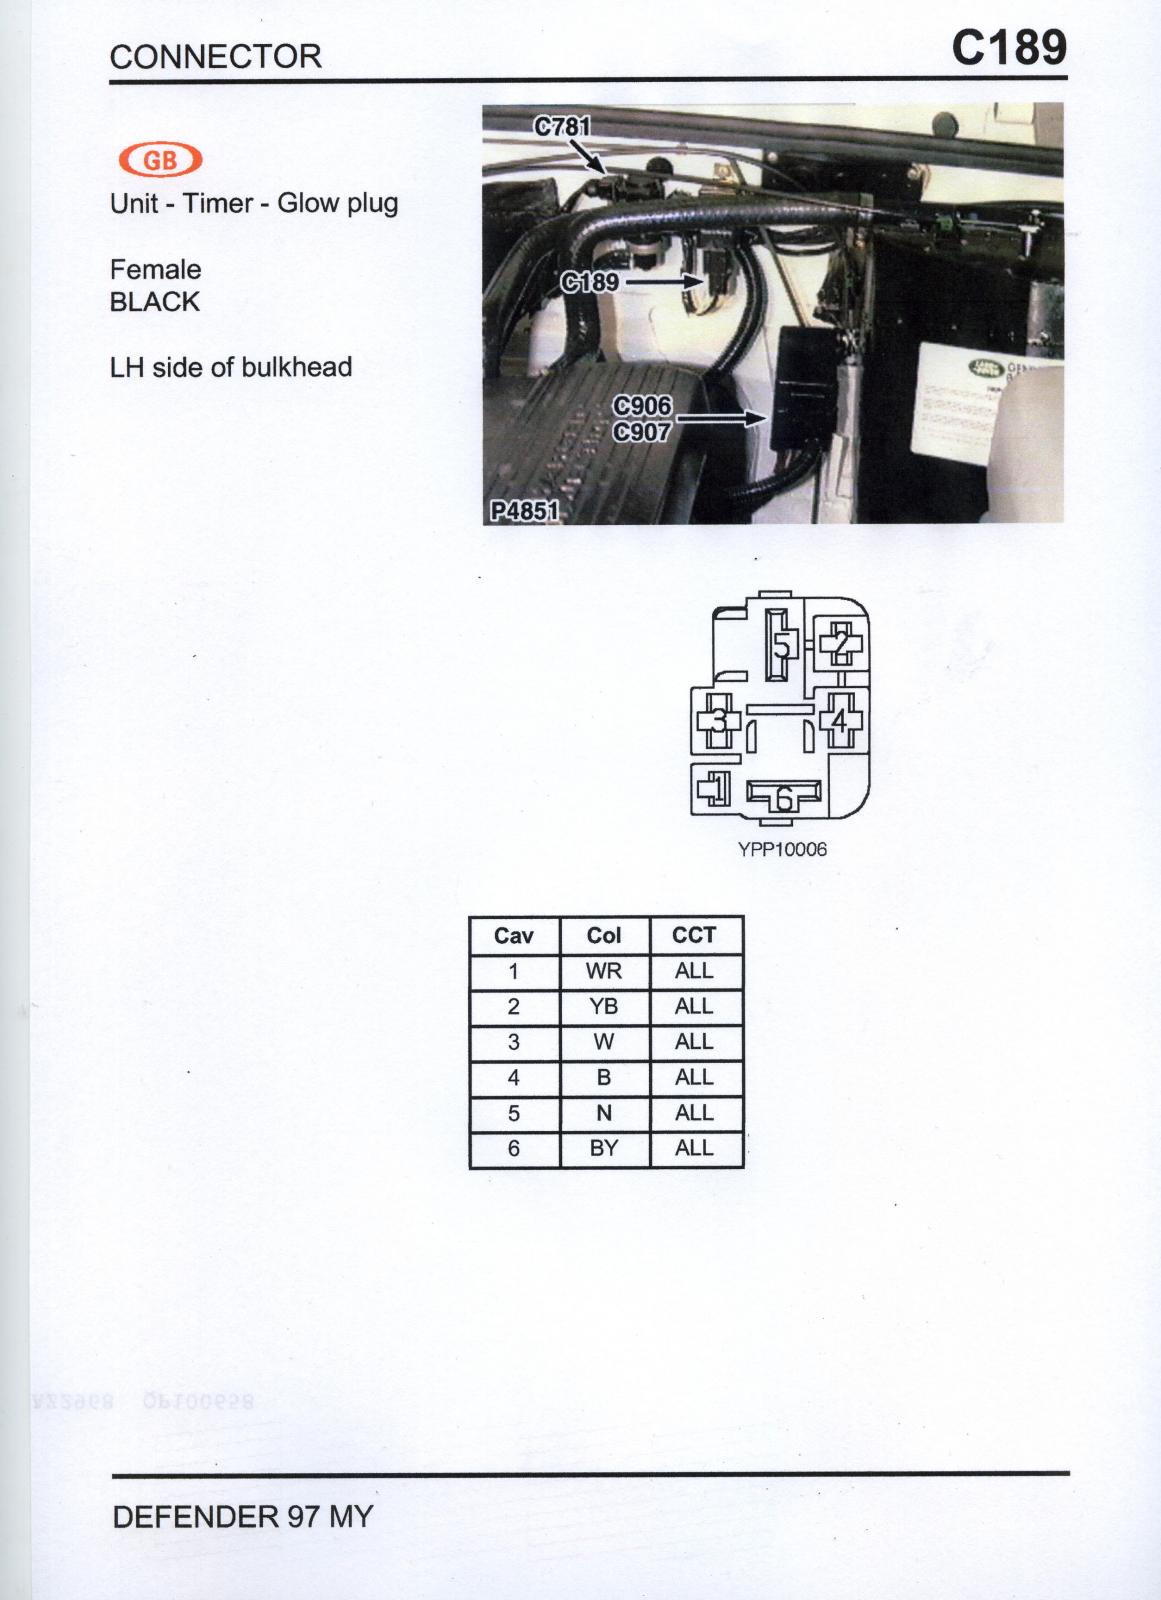 Glow plug defender forum lr4x4 the land rover forum post 20 0 01394800 1320439770thumbg buycottarizona